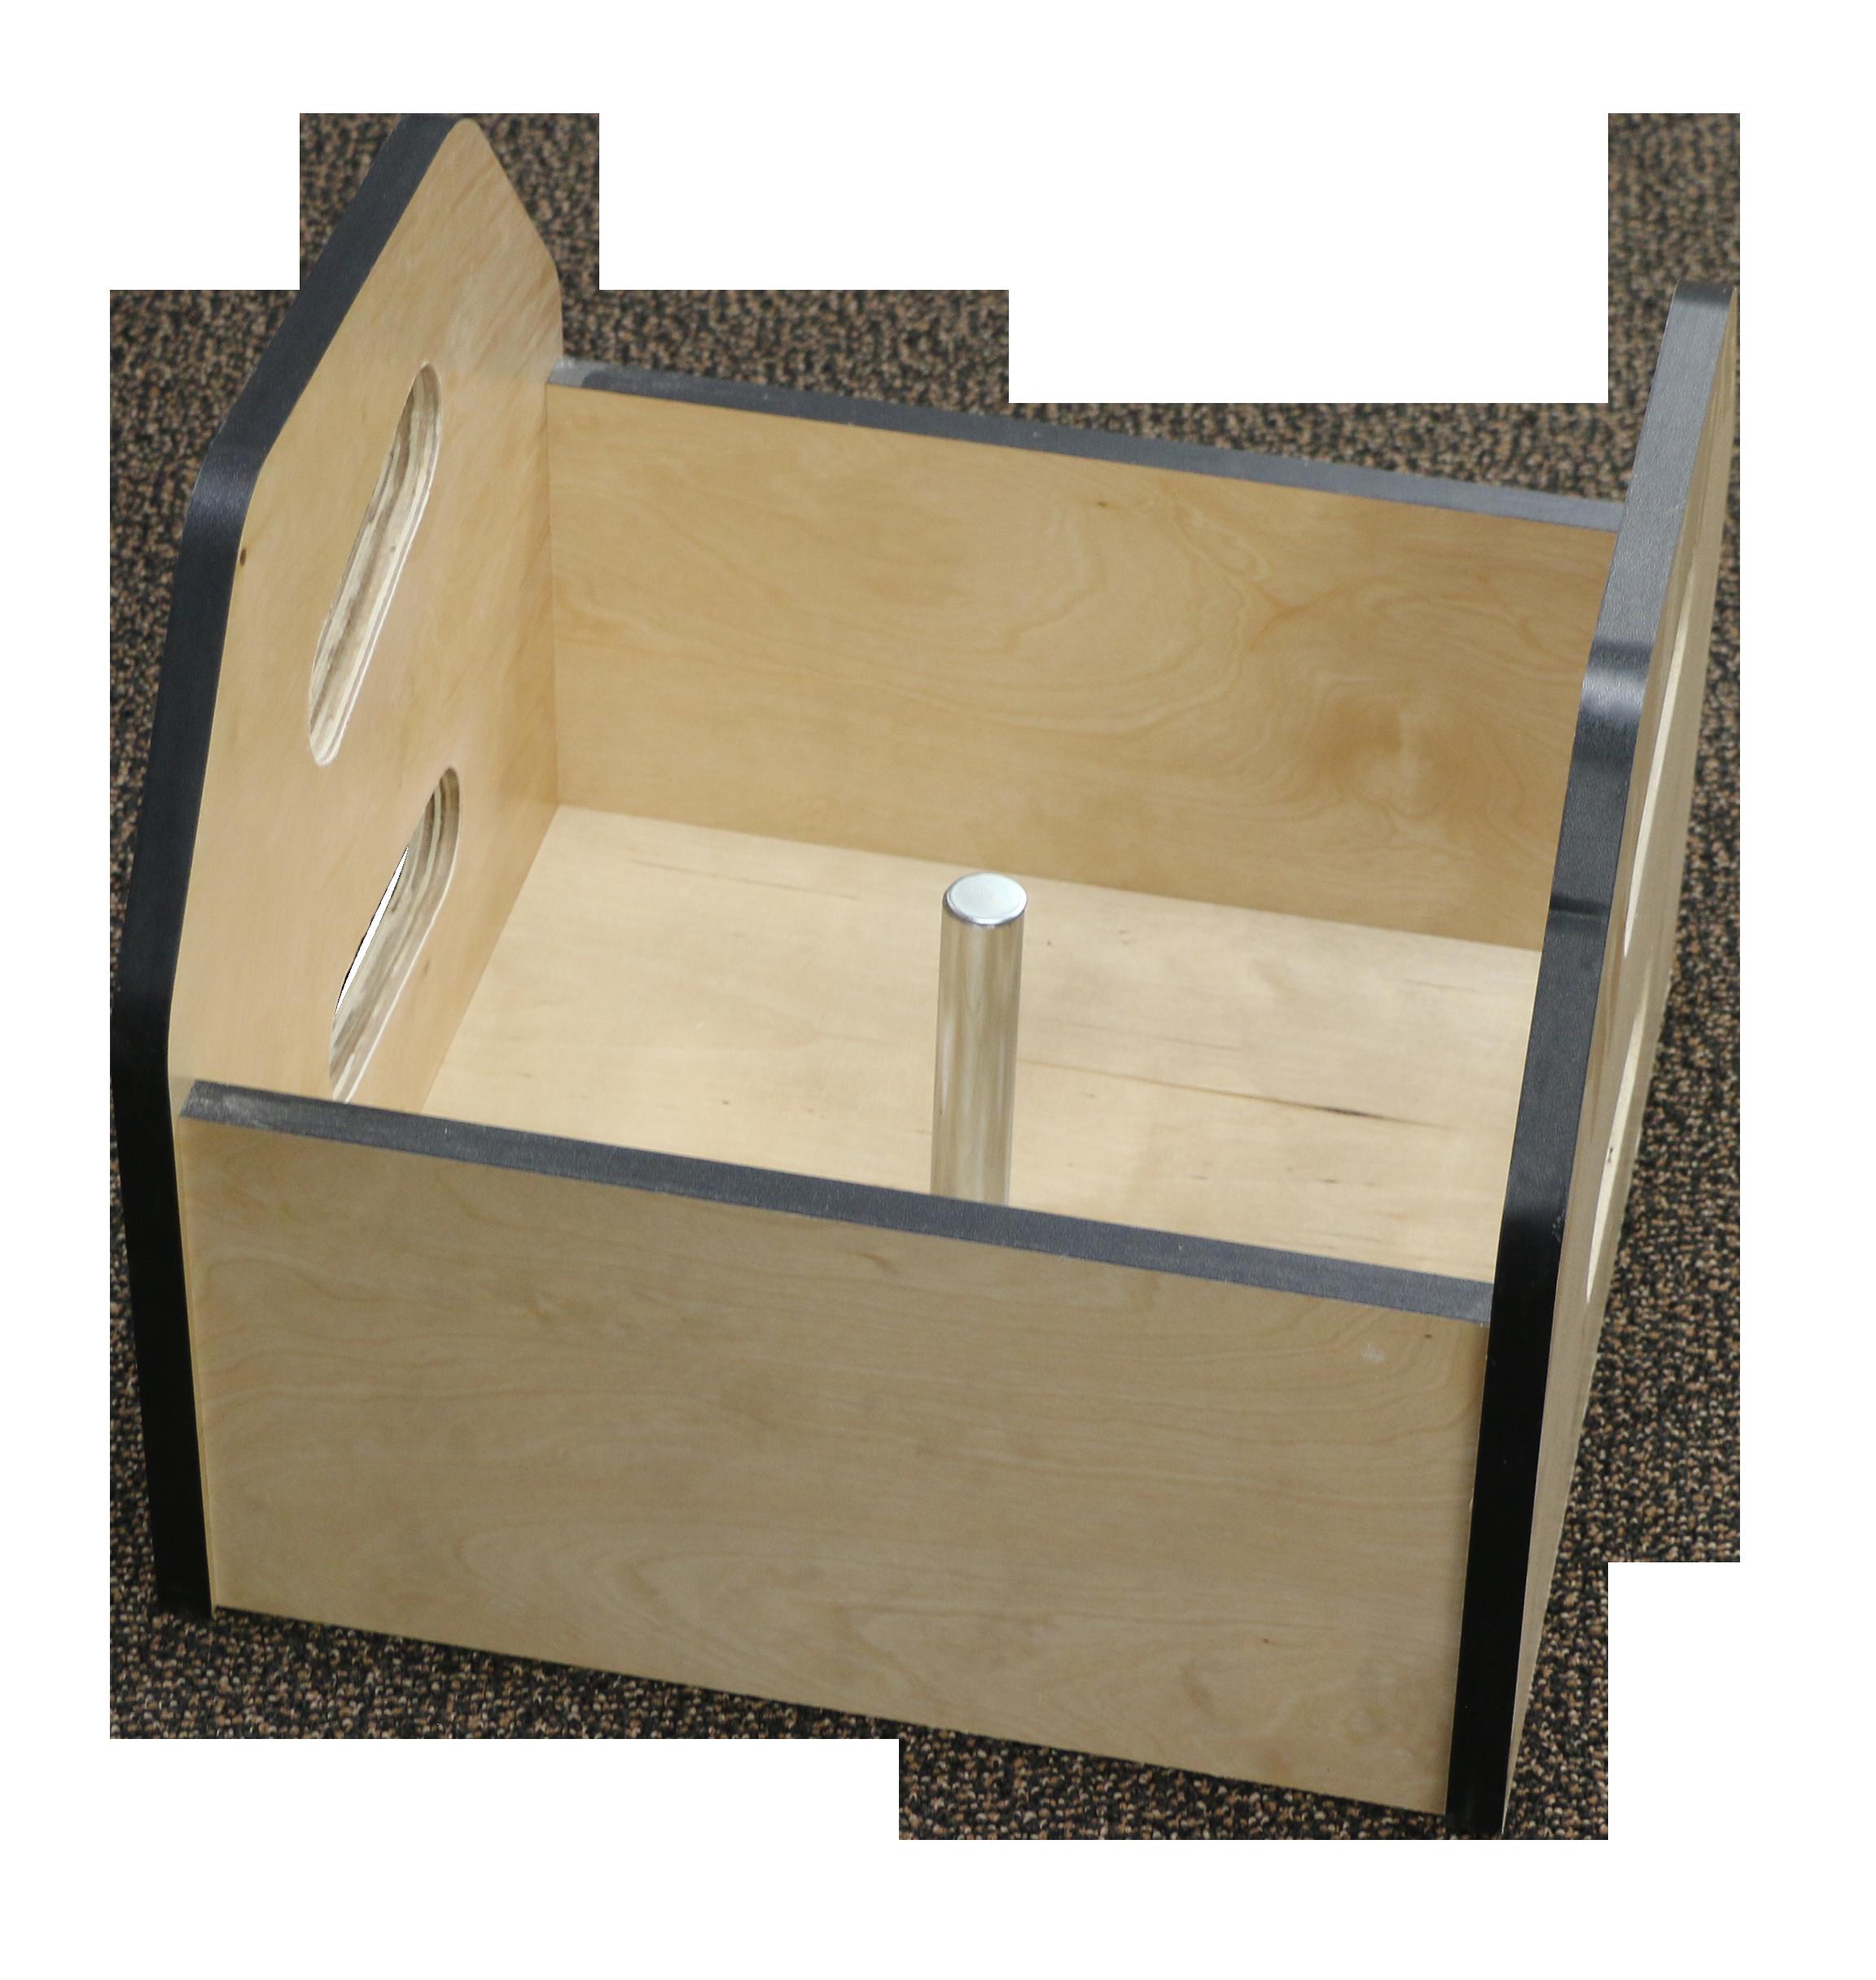 Lift_Box_1_2